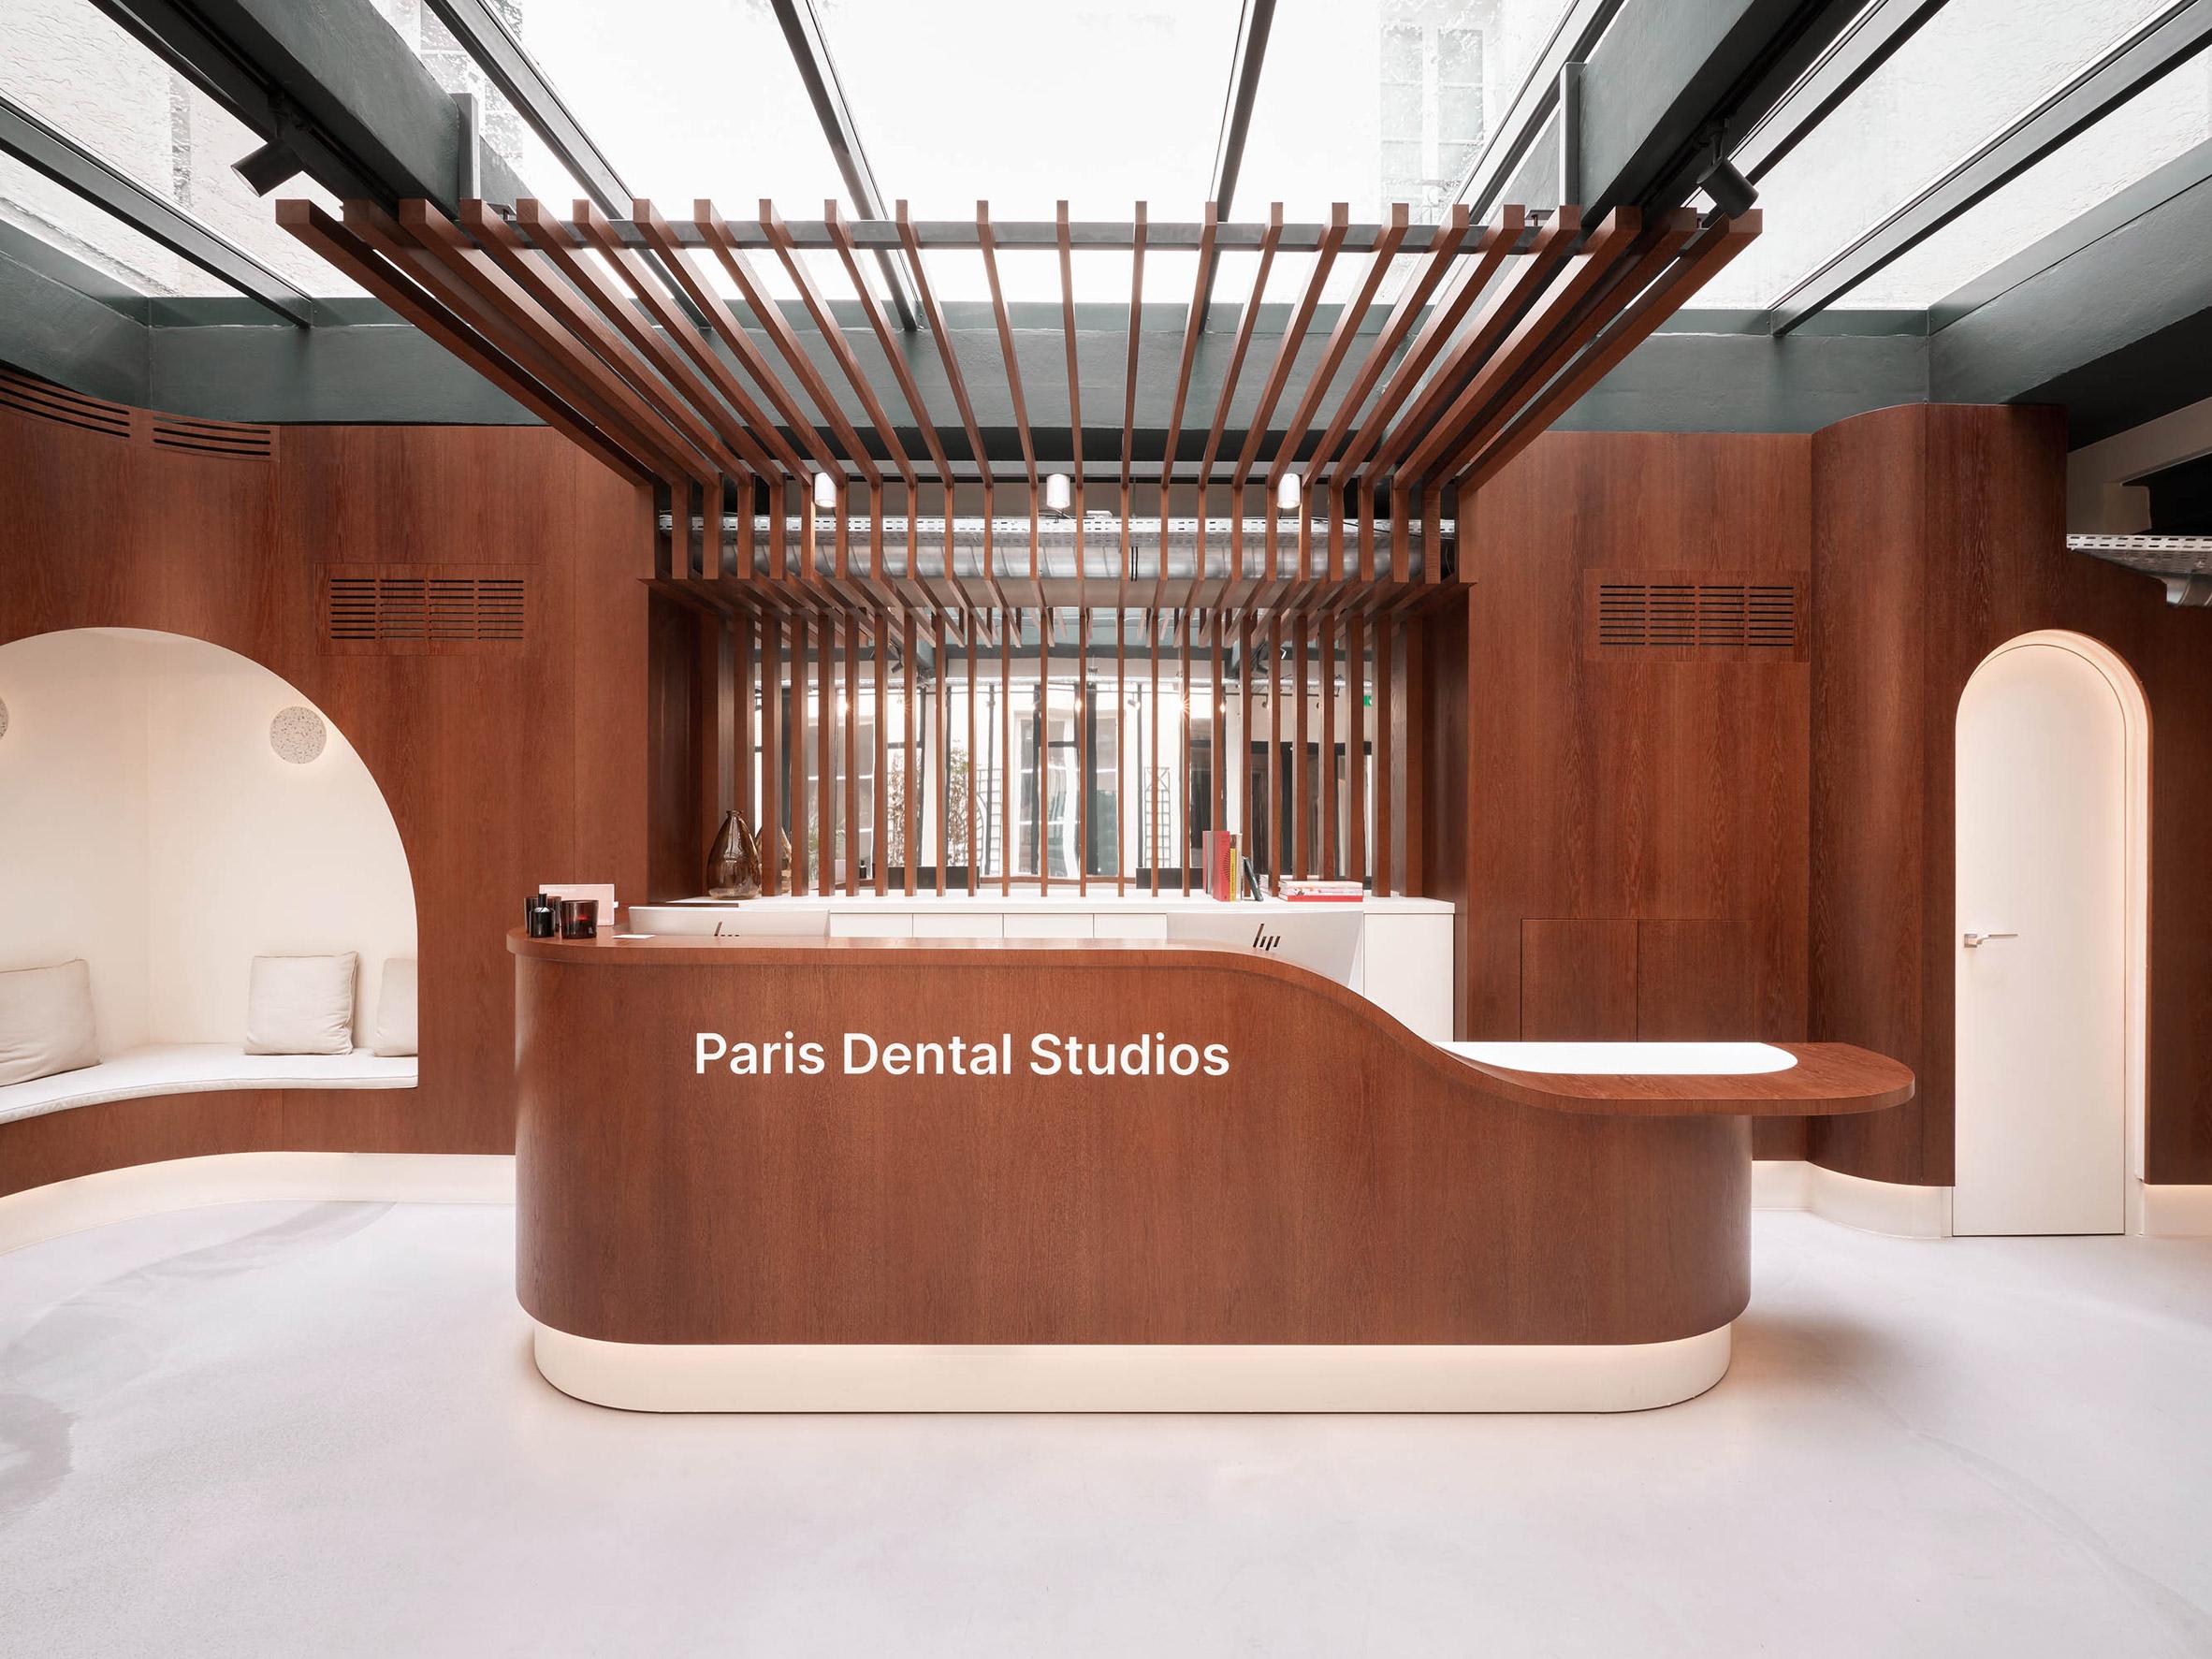 A brown wooden reception desk in Paris Dental Studios